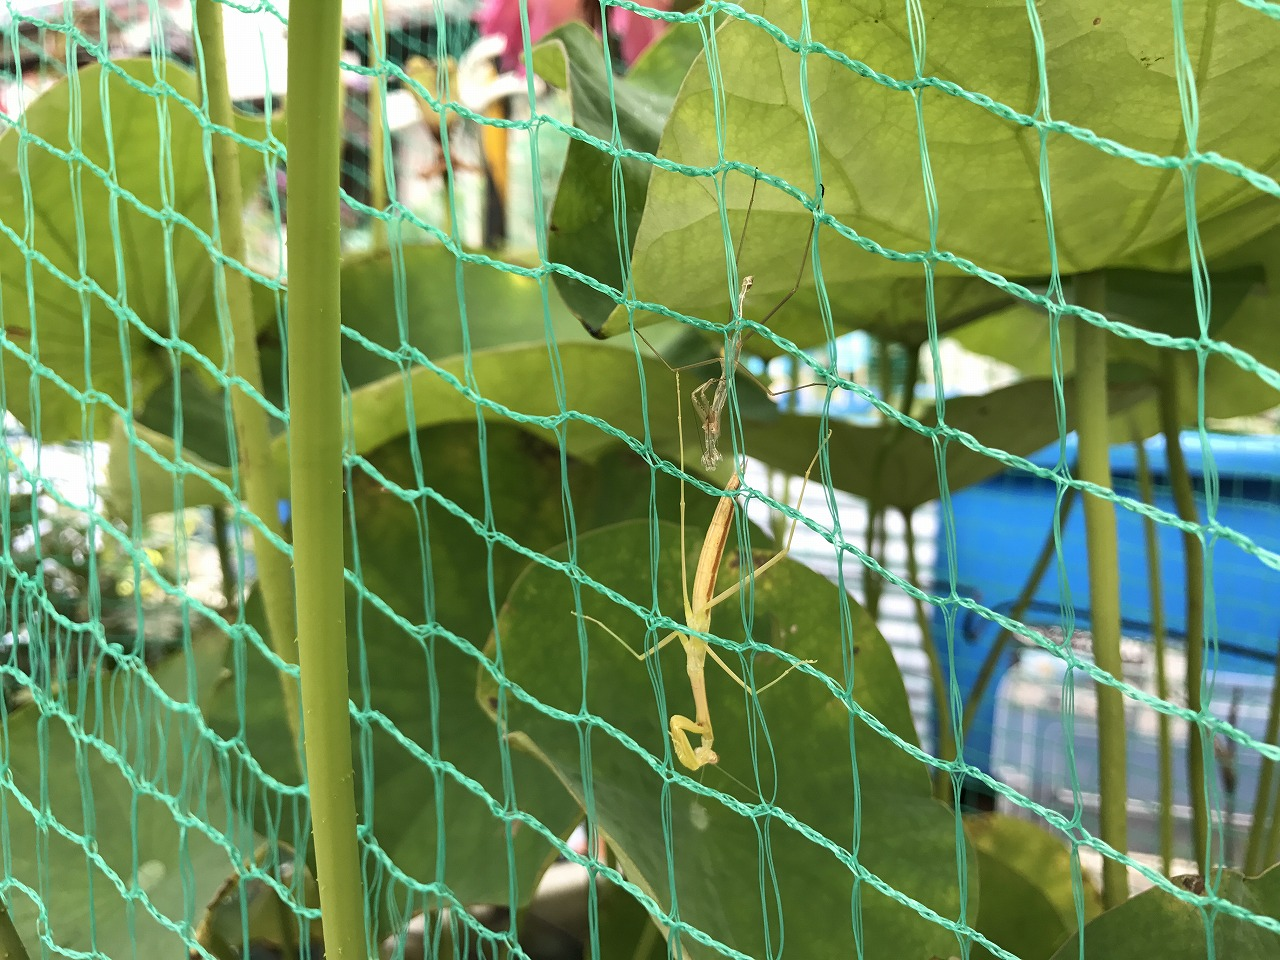 20170706-Mantis-I01.jpg